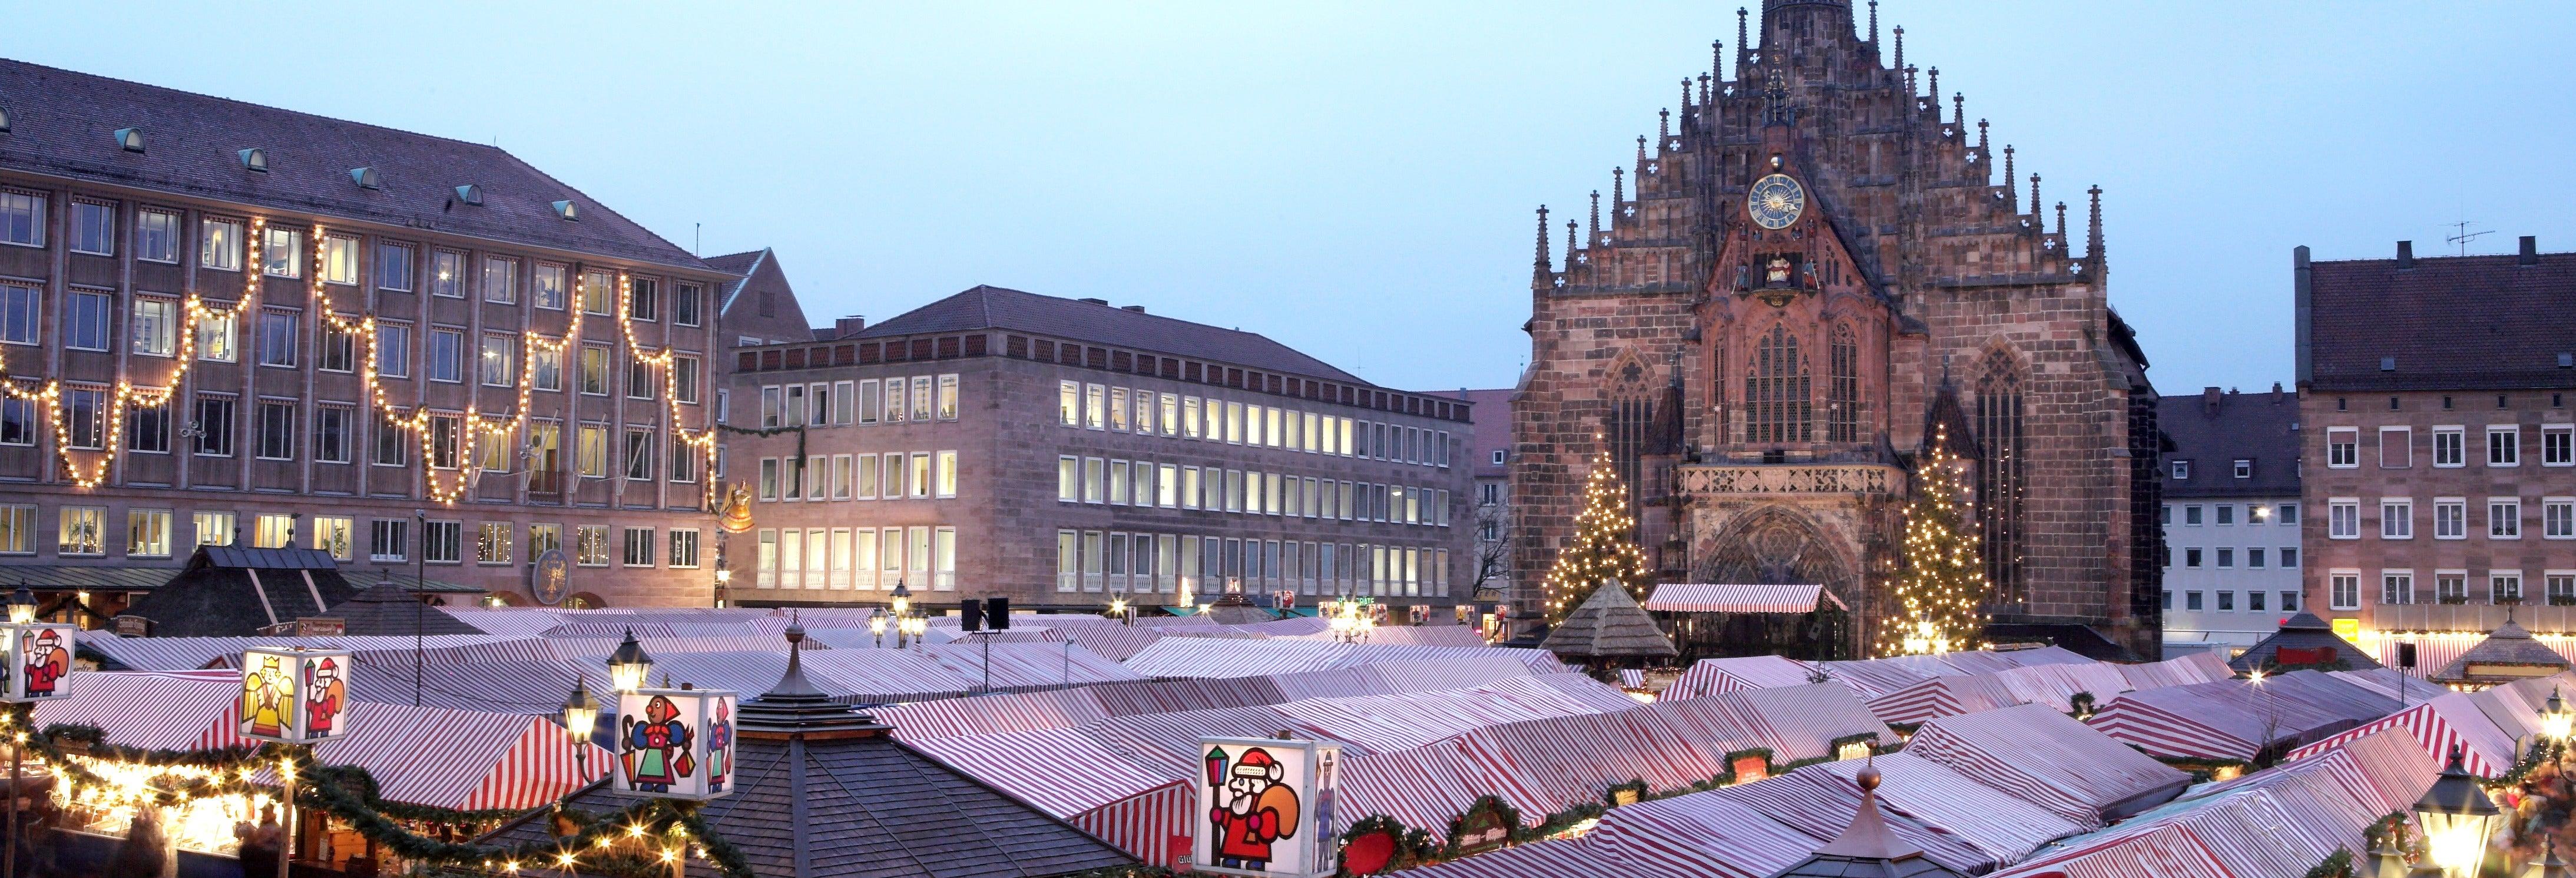 Tour navideño por Núremberg